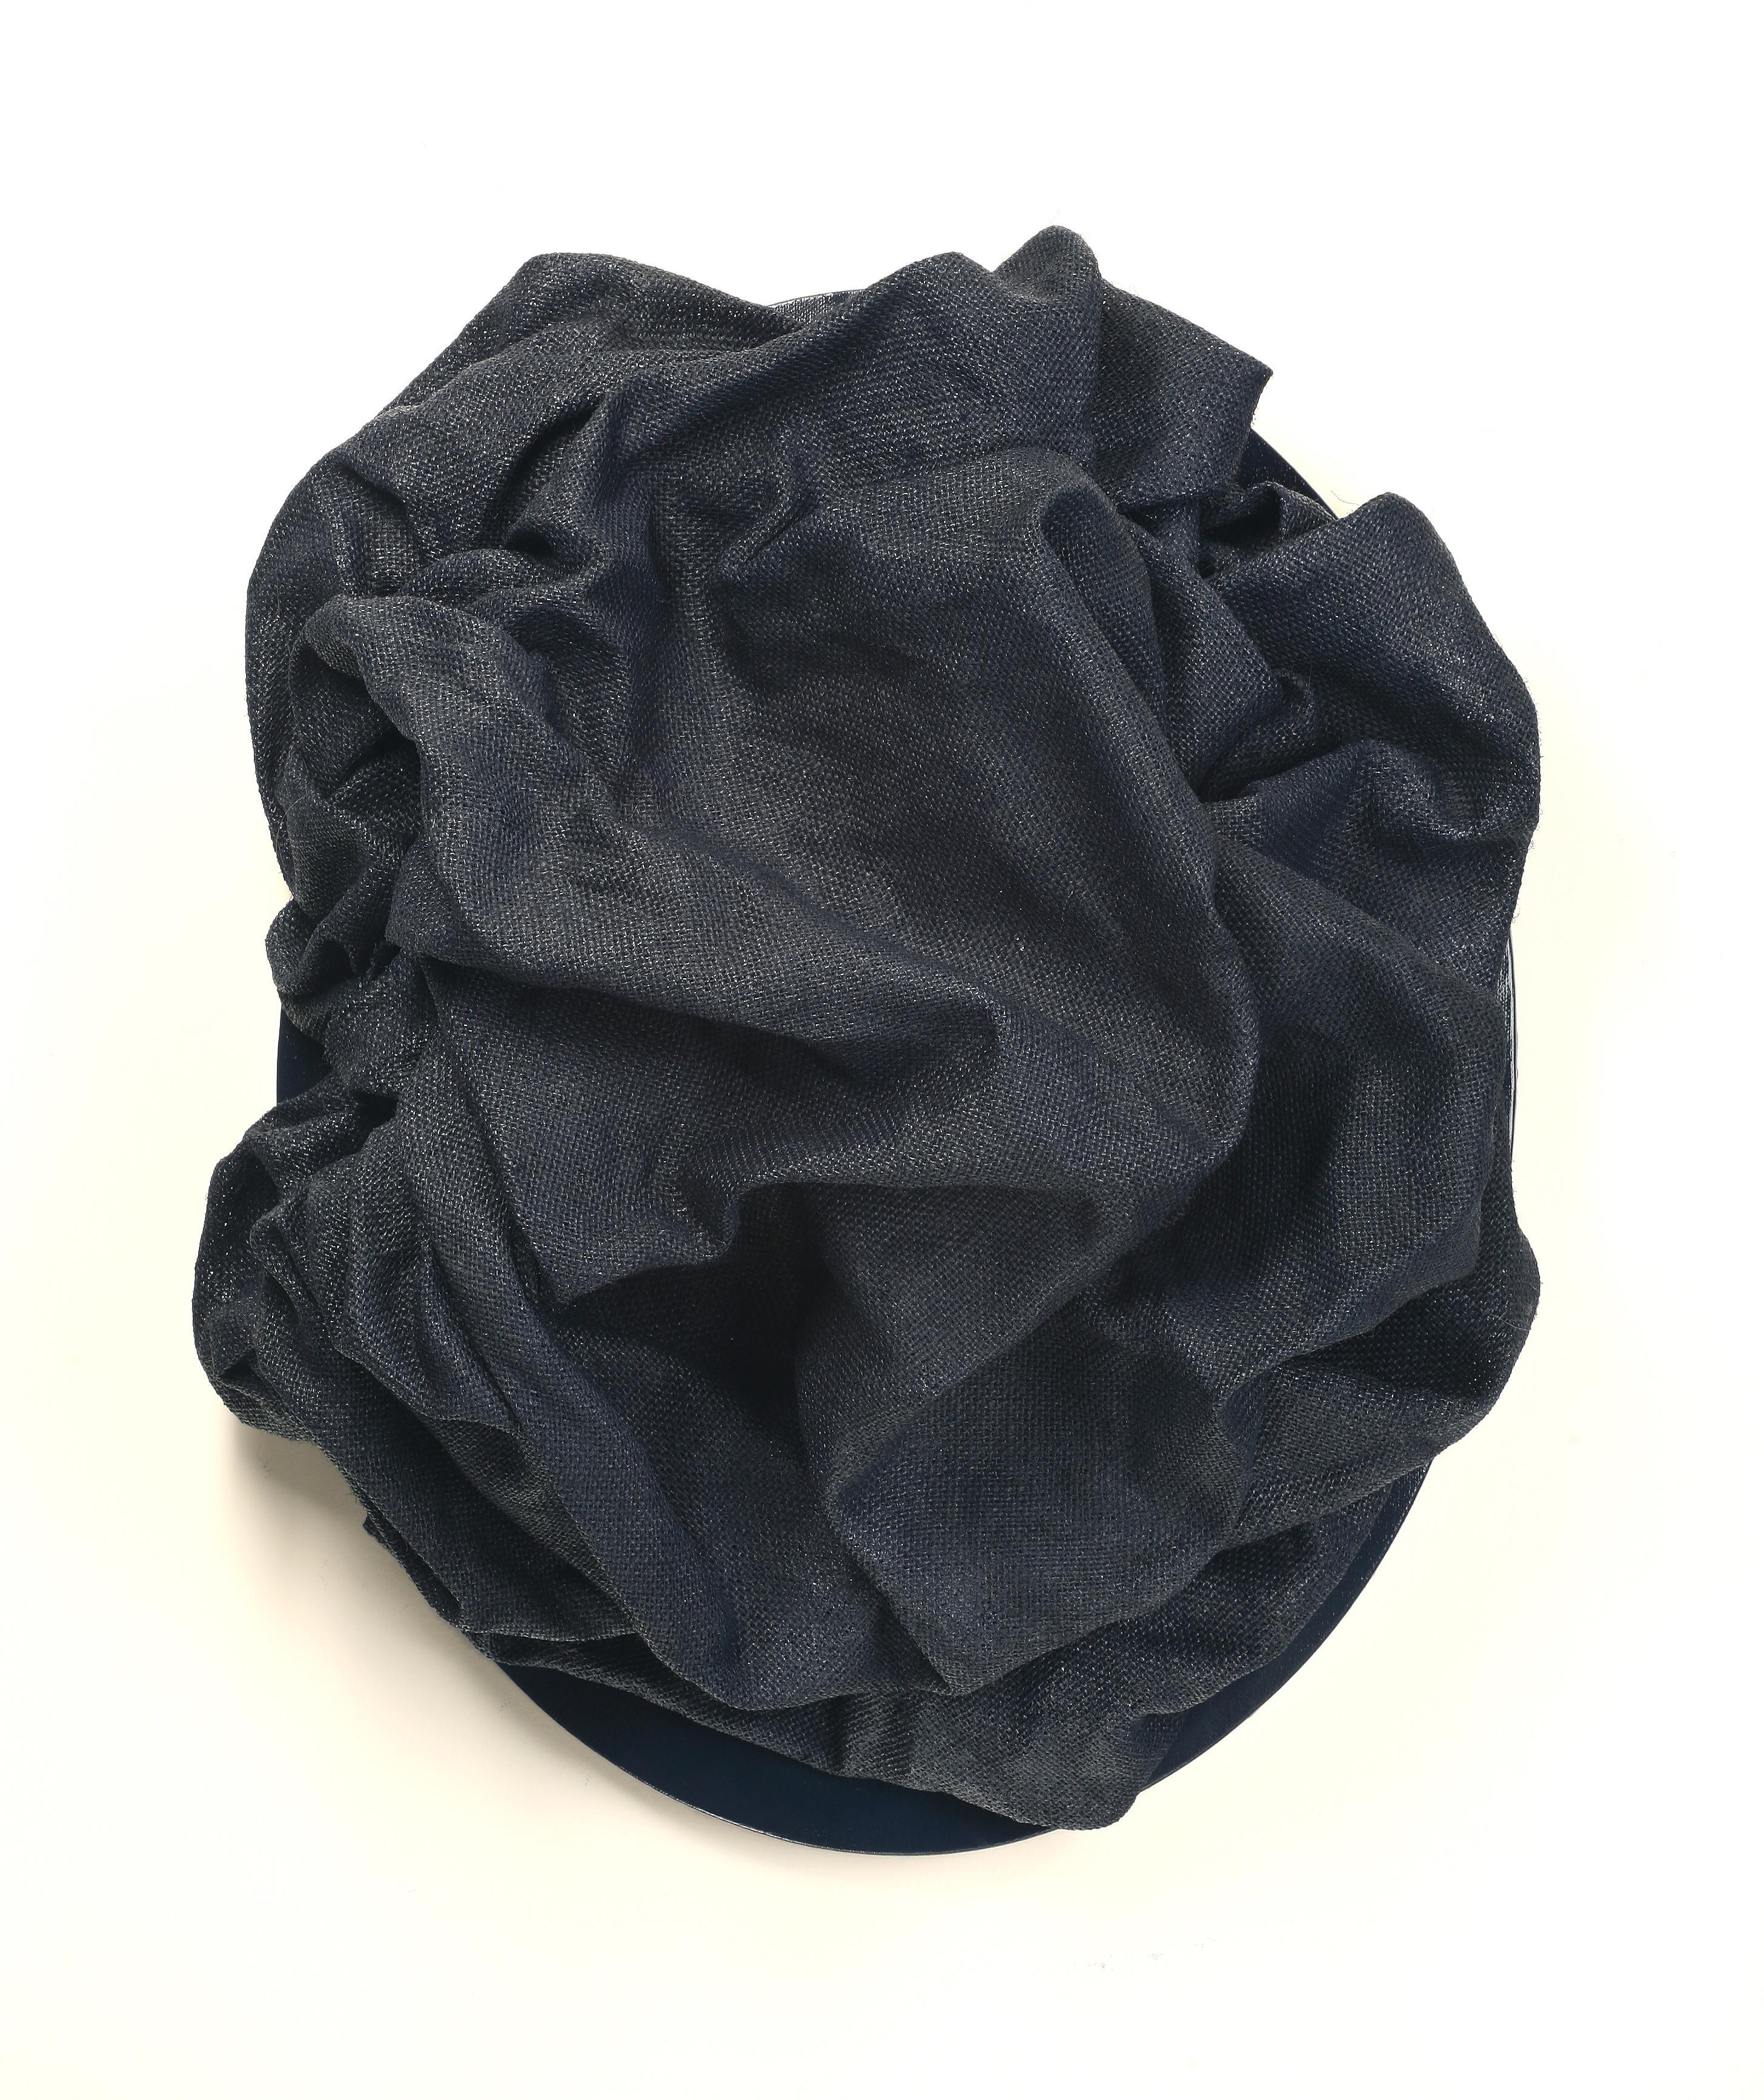 Indigo Folds 3 (fabric art, wall sculpture, contemporary design, textile arts)